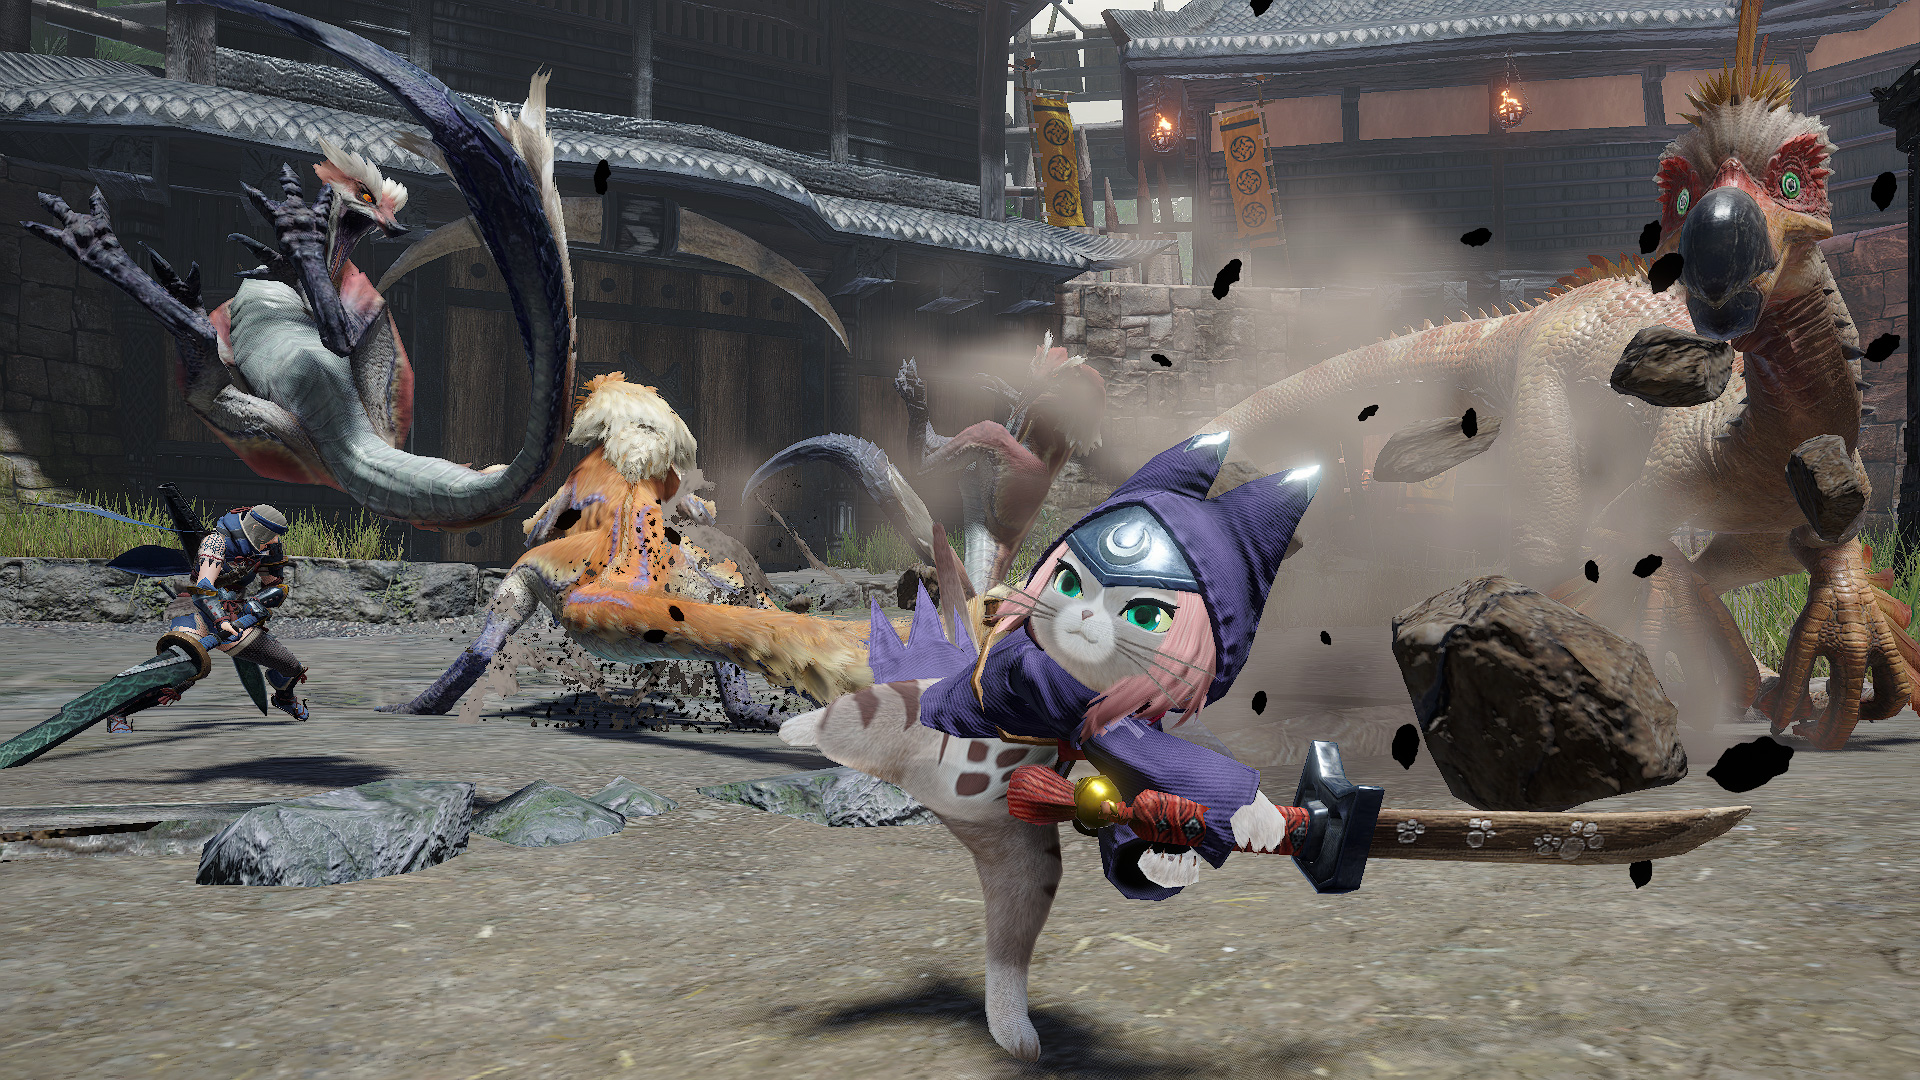 armadura superpuesta de Tsukino para camarada Felyne (de Monster Hunter Stories 2) en Rise disfrazador